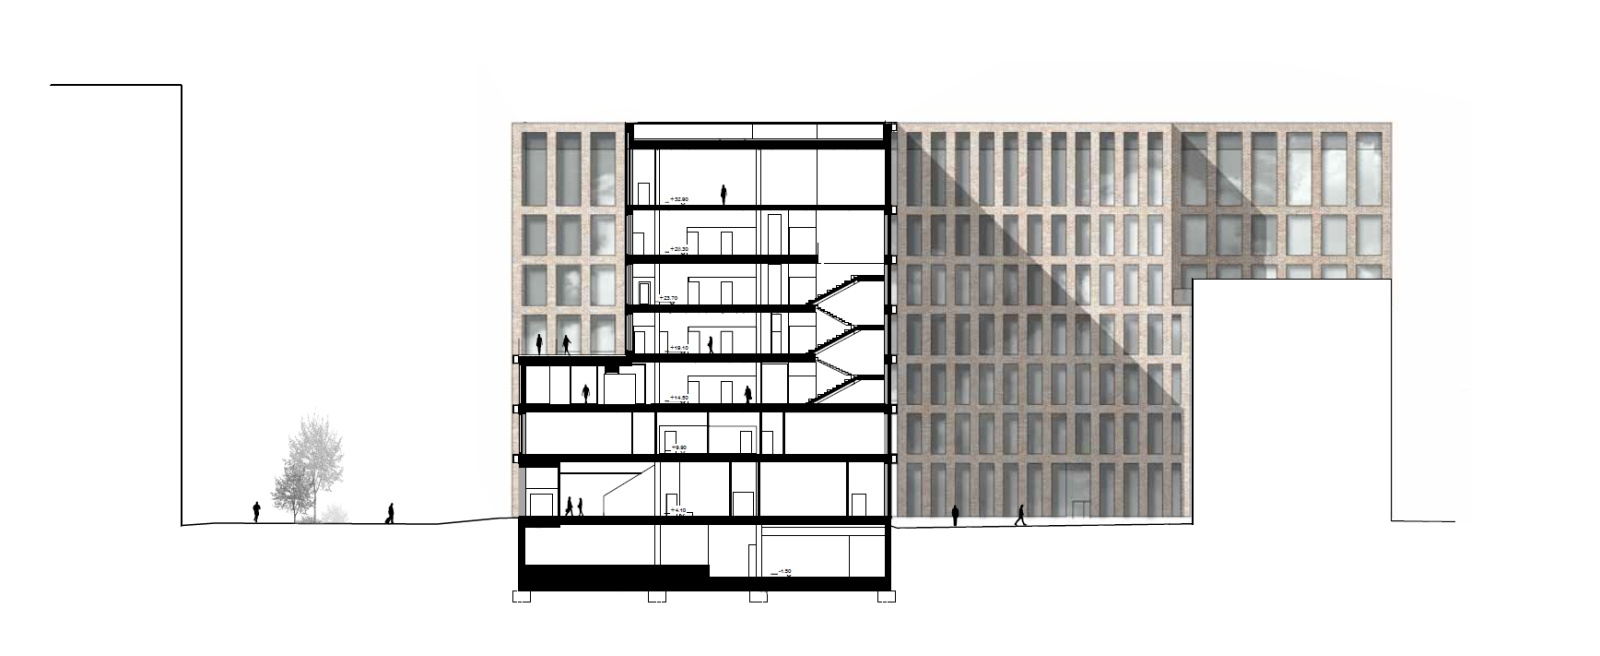 Urban Environment House